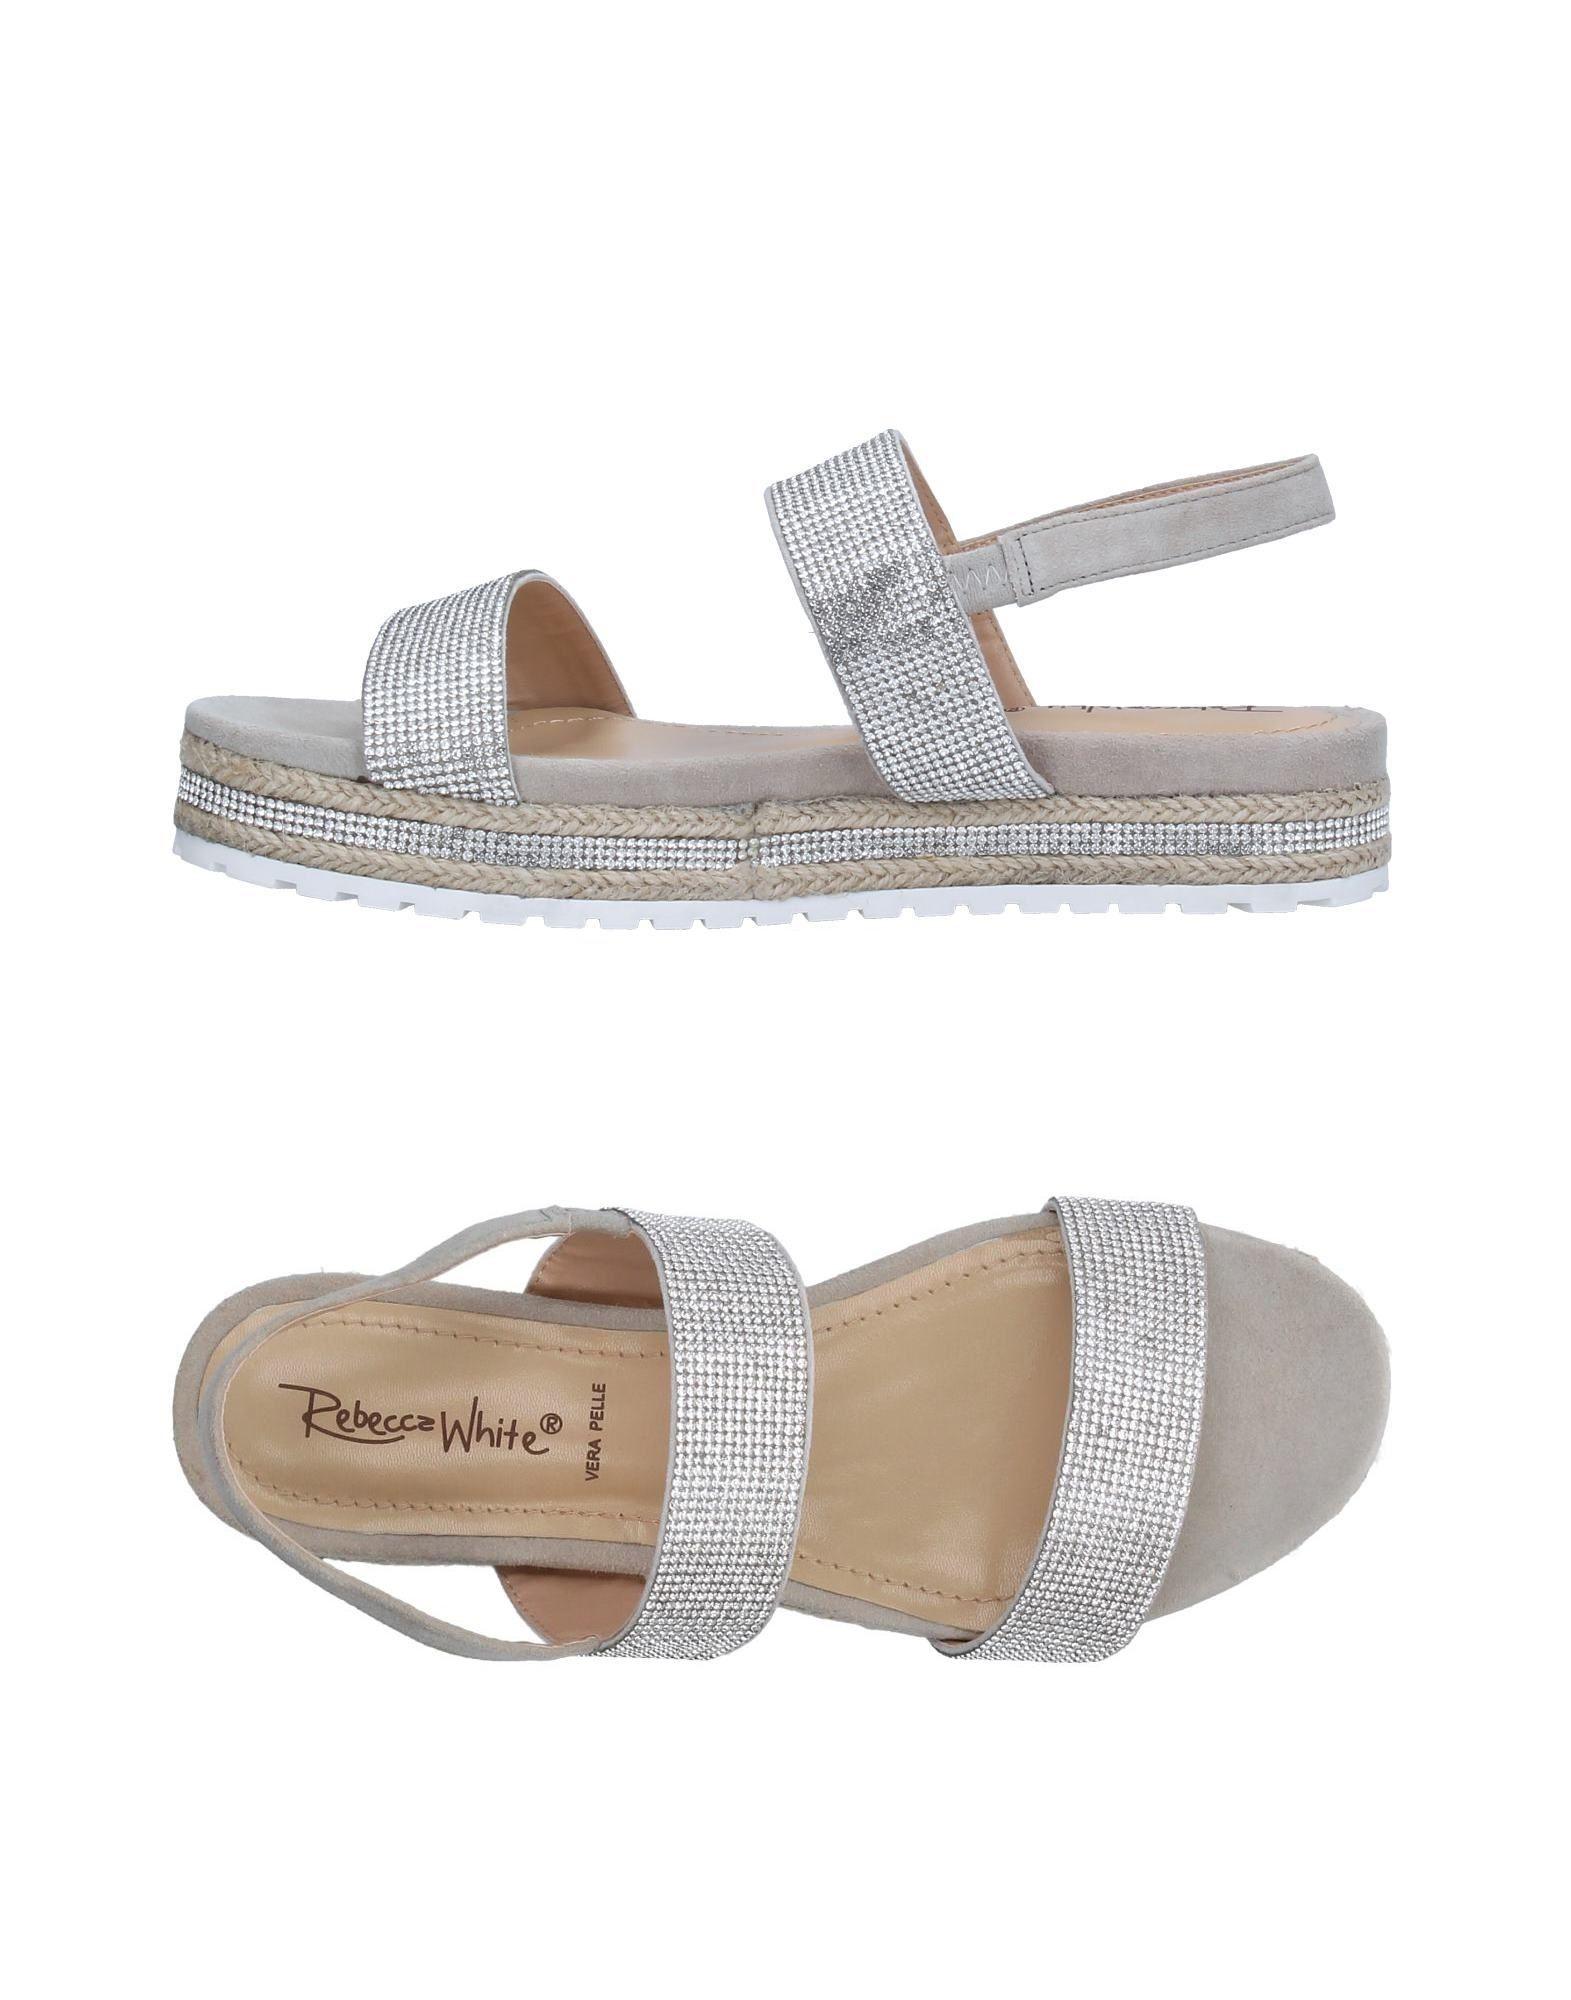 Rebecca White Espadrilles Damen  11261997LD Gute Qualität beliebte Schuhe